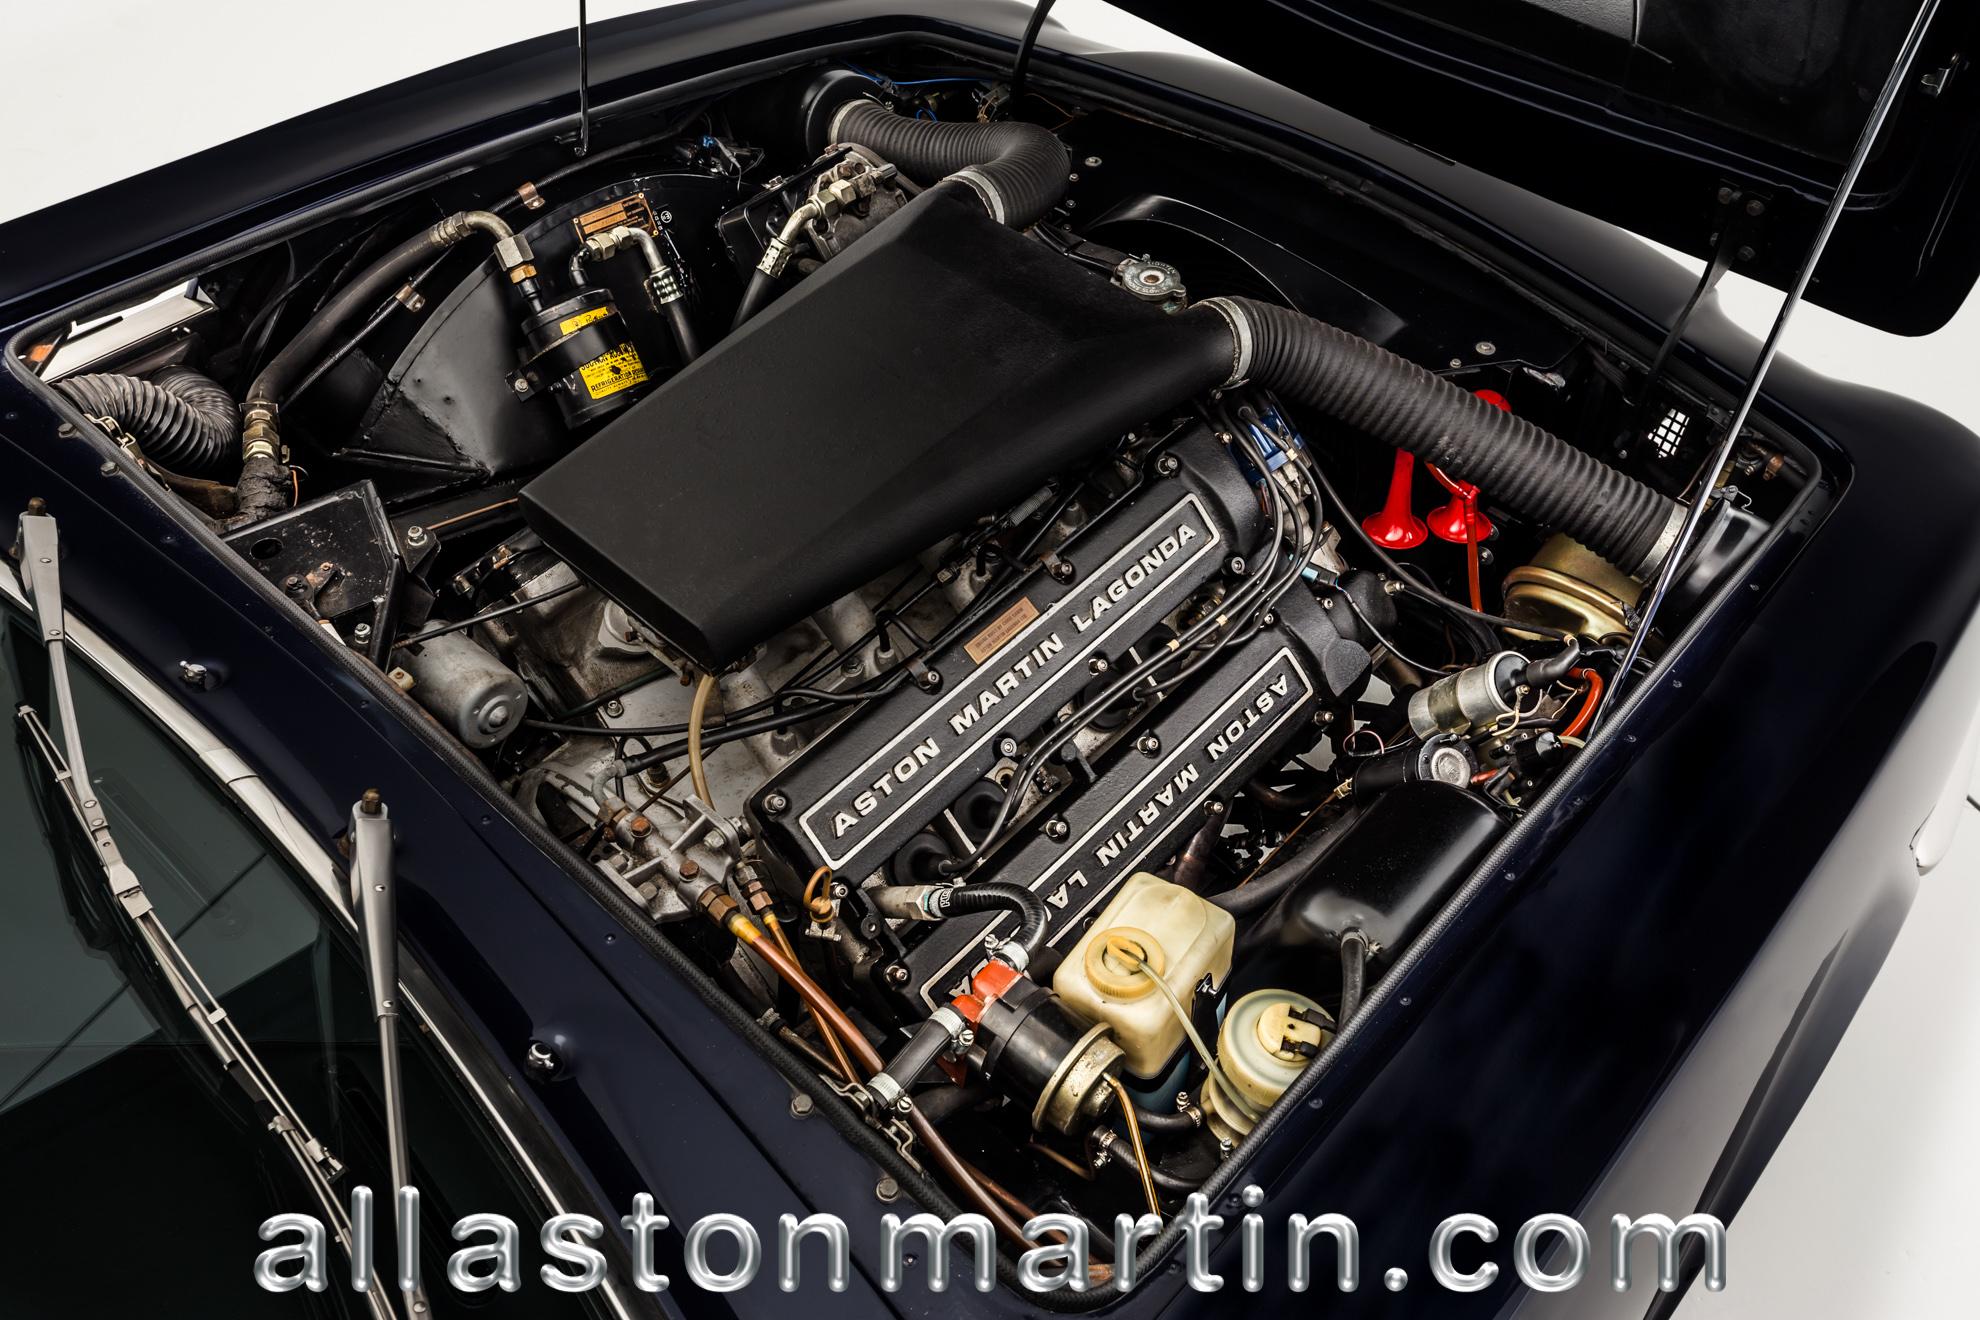 Aston Martin Cars For Sale - Buy Aston Martin - Details - All Aston on wooden car engine, aston martin lagonda, volkwagen engine, gallardo spyder engine, toyota iq, alfa romeo engine, nissan engine, rolls-royce phantom, lagonda engine, subaru engine, gobron-brillie engine, maserati engine, die another day, volvo s60, fiat engine, trike engine, vw engine, v12 engine, audi engine, aston martin one-77, aston martin virage, lamborghini murciélago, austin american engine, mazda engine, aston martin vantage, isuzu engine, luxury car engine, bmw z8, toyota engine, bmw engine, land rover engine, aston martin db4, aston martin rapide, aston martin dbs, aston martin dbs v12,